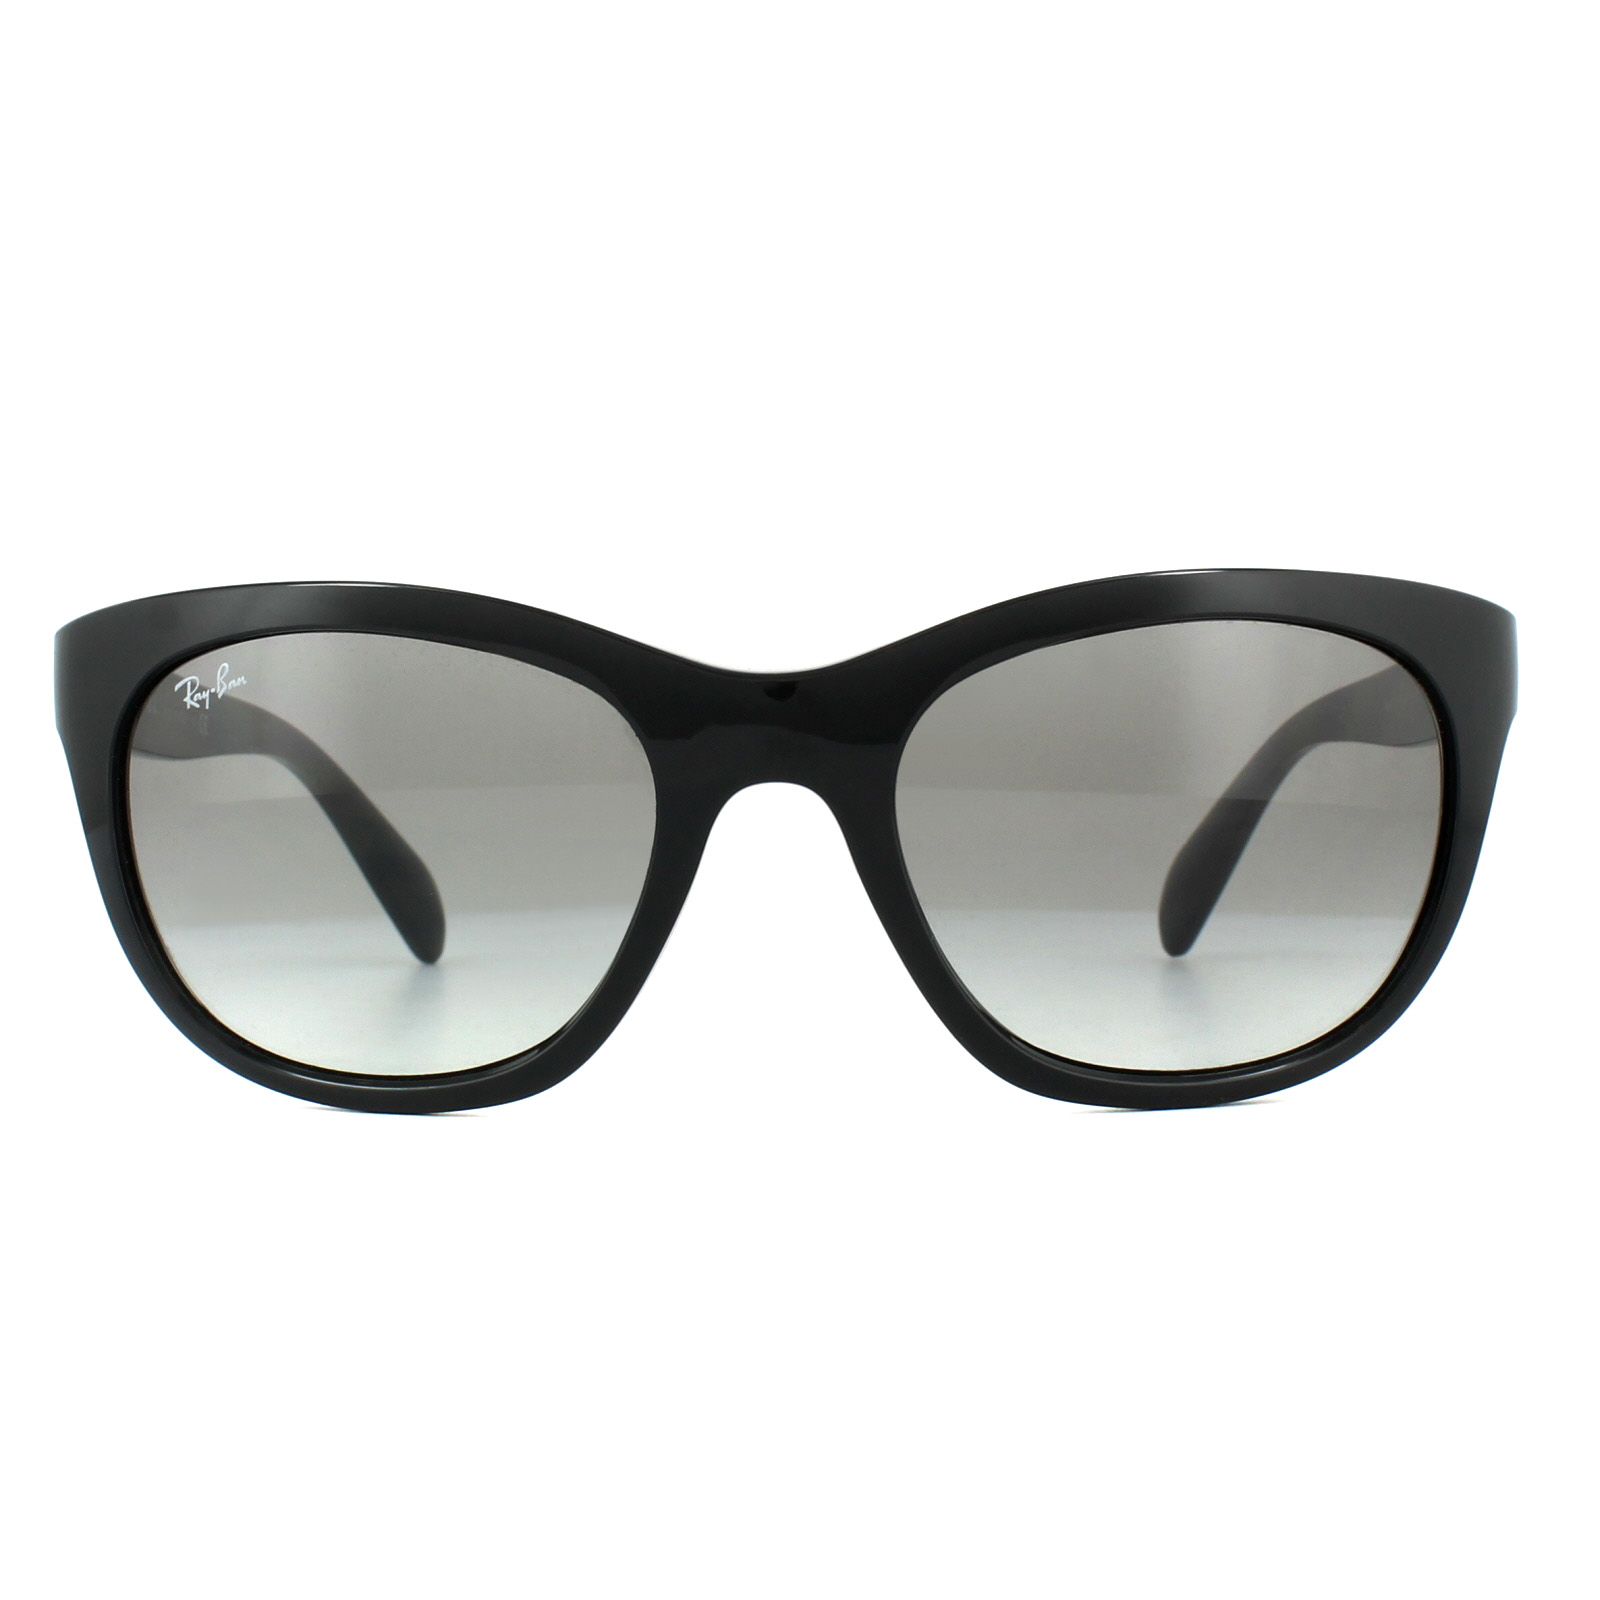 93049594cb Sentinel Ray-Ban Sunglasses 4216 601 11 Black Grey Gradient